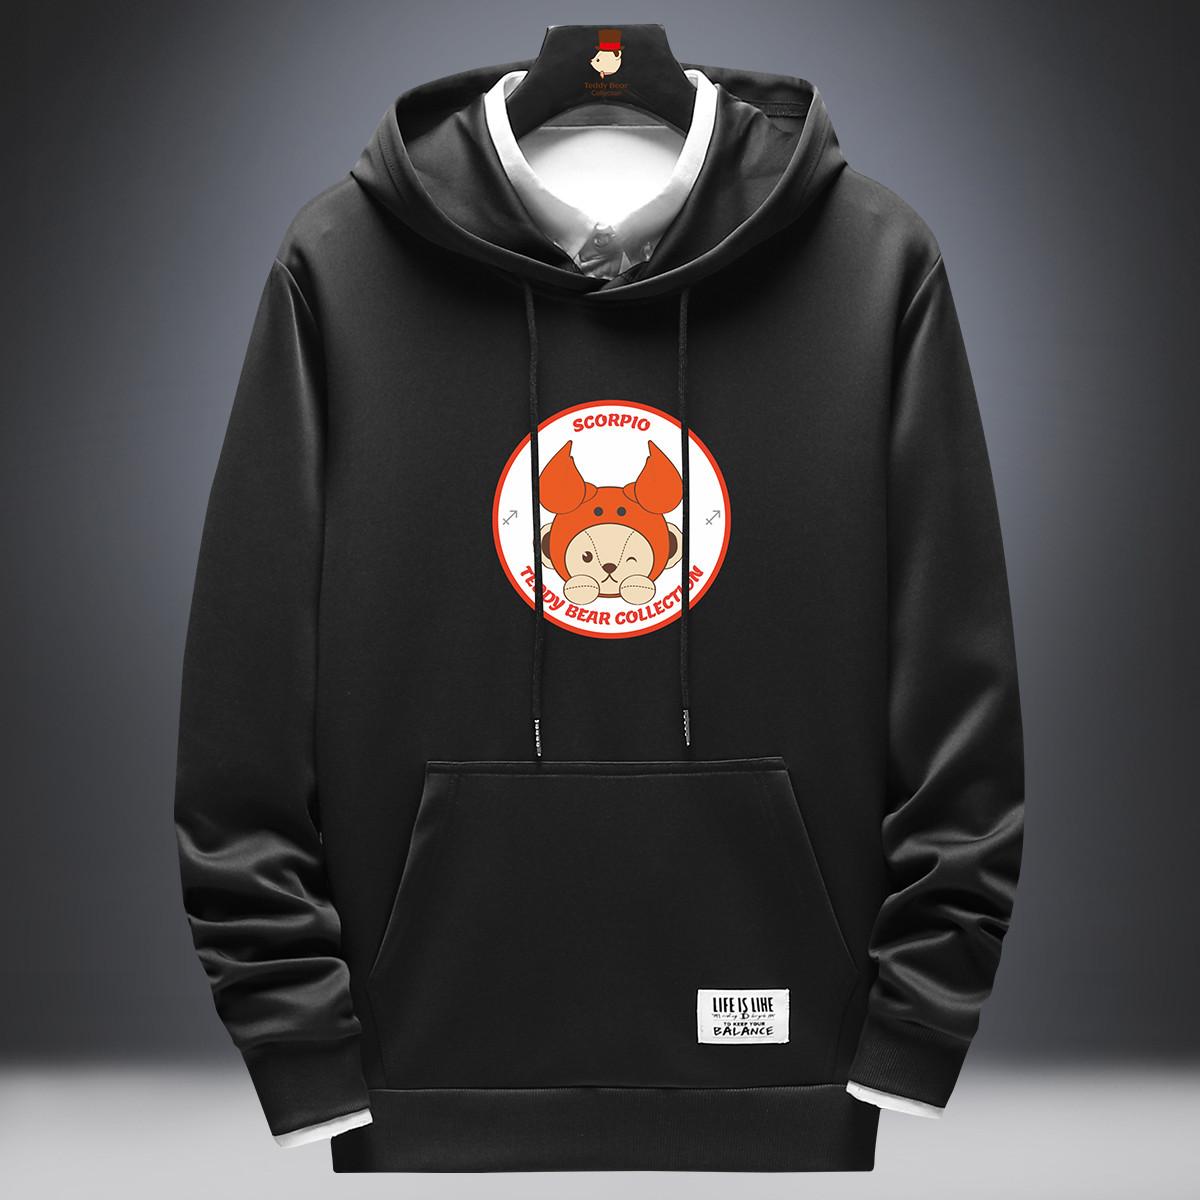 Teddy Bear Collection 泰迪星座系列 天蝎座卡通印花卫衣  青少年宽松潮流运动卫衣男